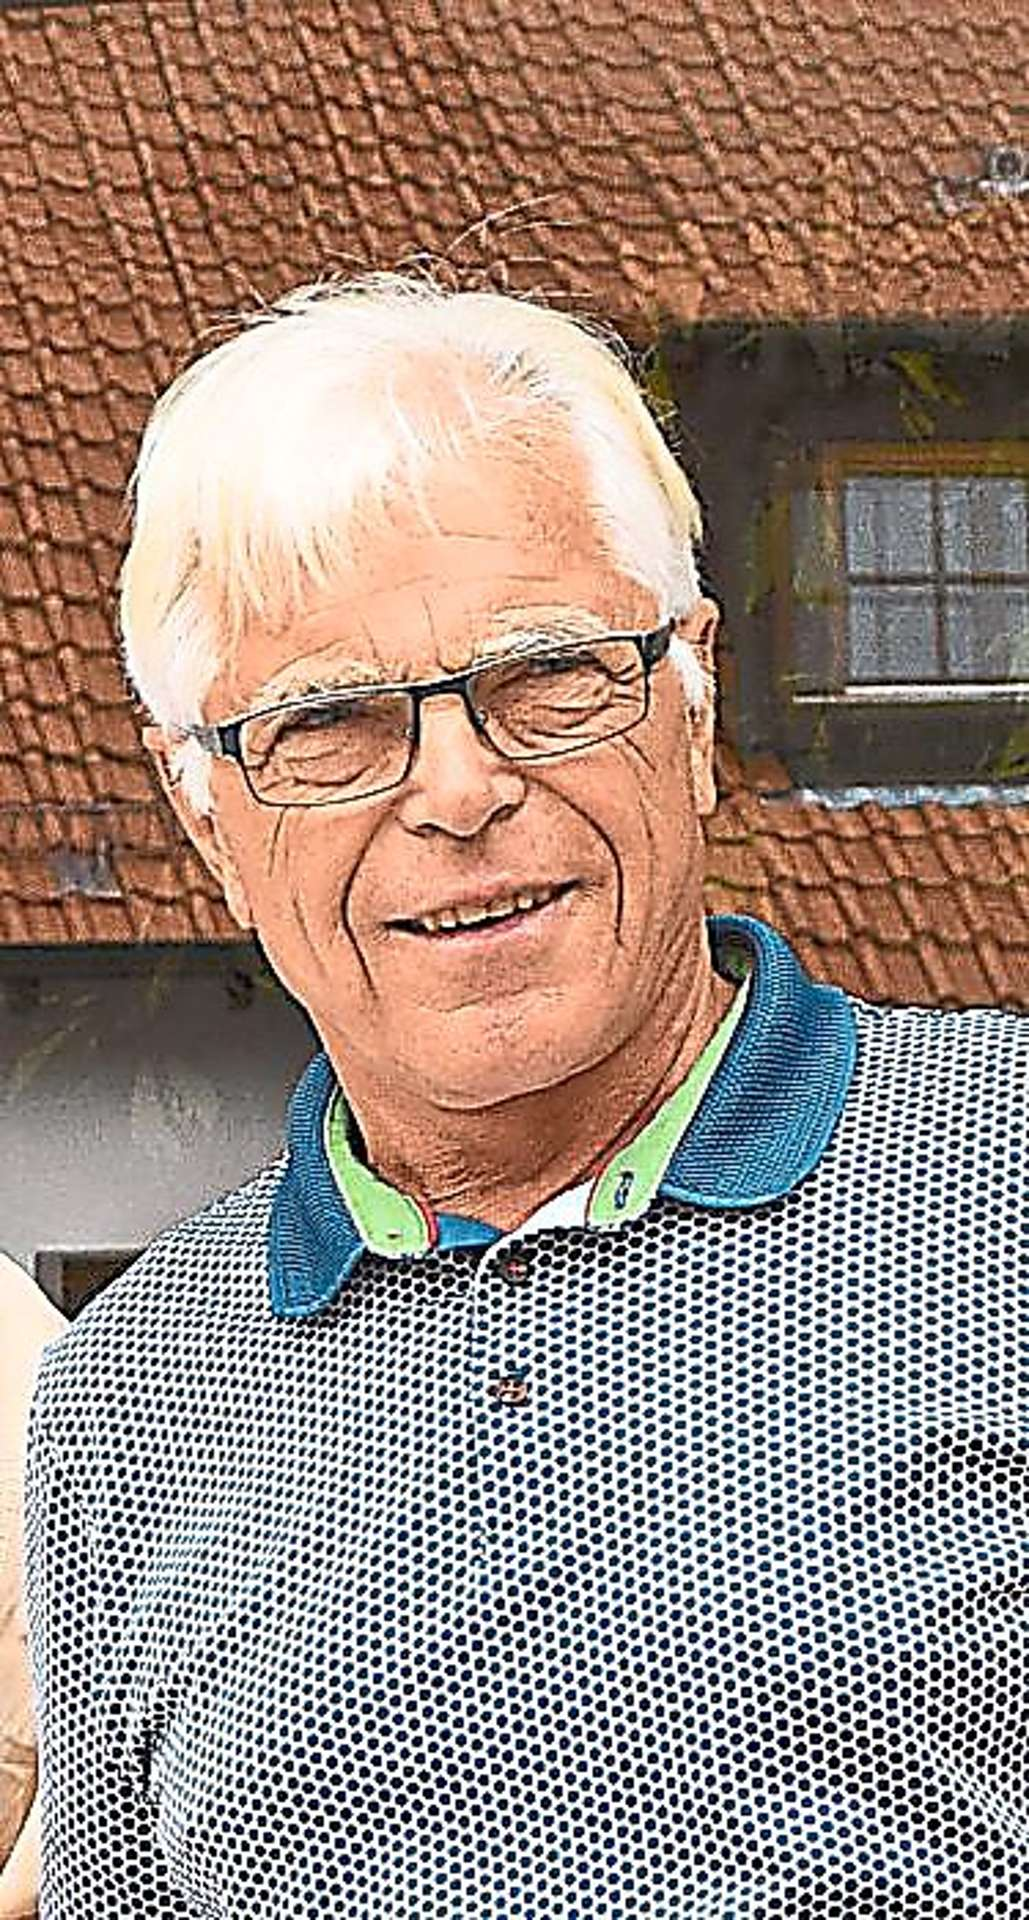 Bernd single sigmaringen